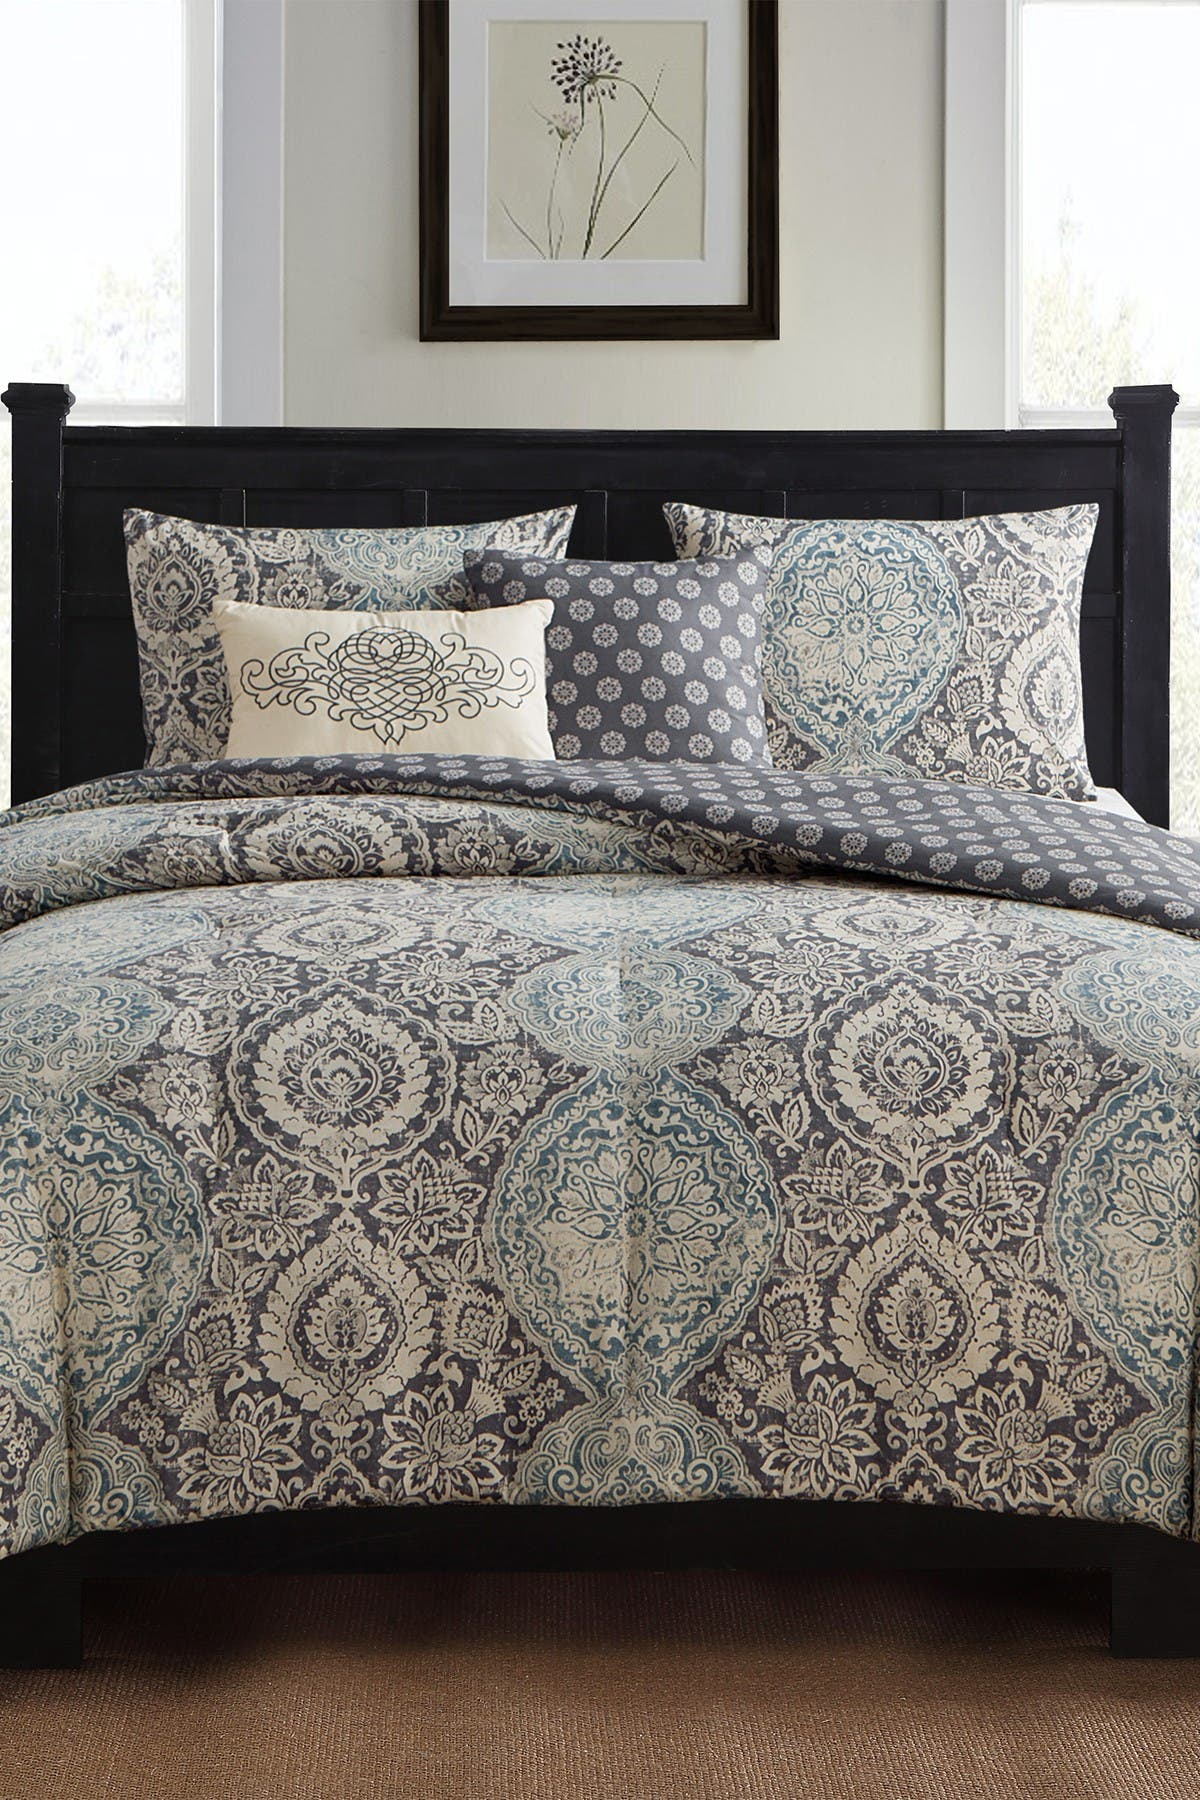 Vcny Home Full Queen Victoria Reversible Paisley Comforter Set Neutral Nordstrom Rack